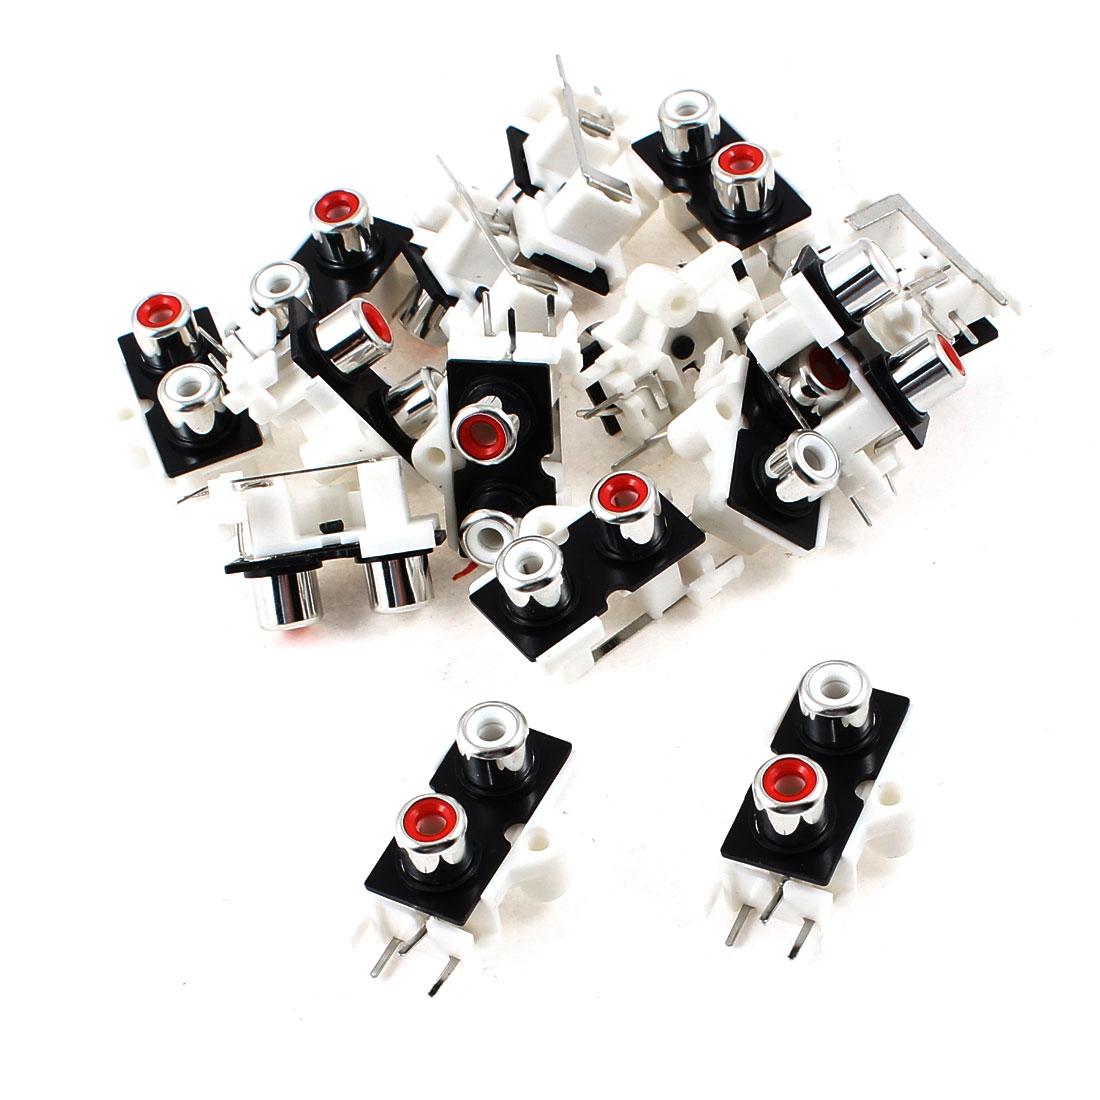 15 Pcs PCB Mount 2 RCA Female Outlet Jack Audio Video AV Connector Socket